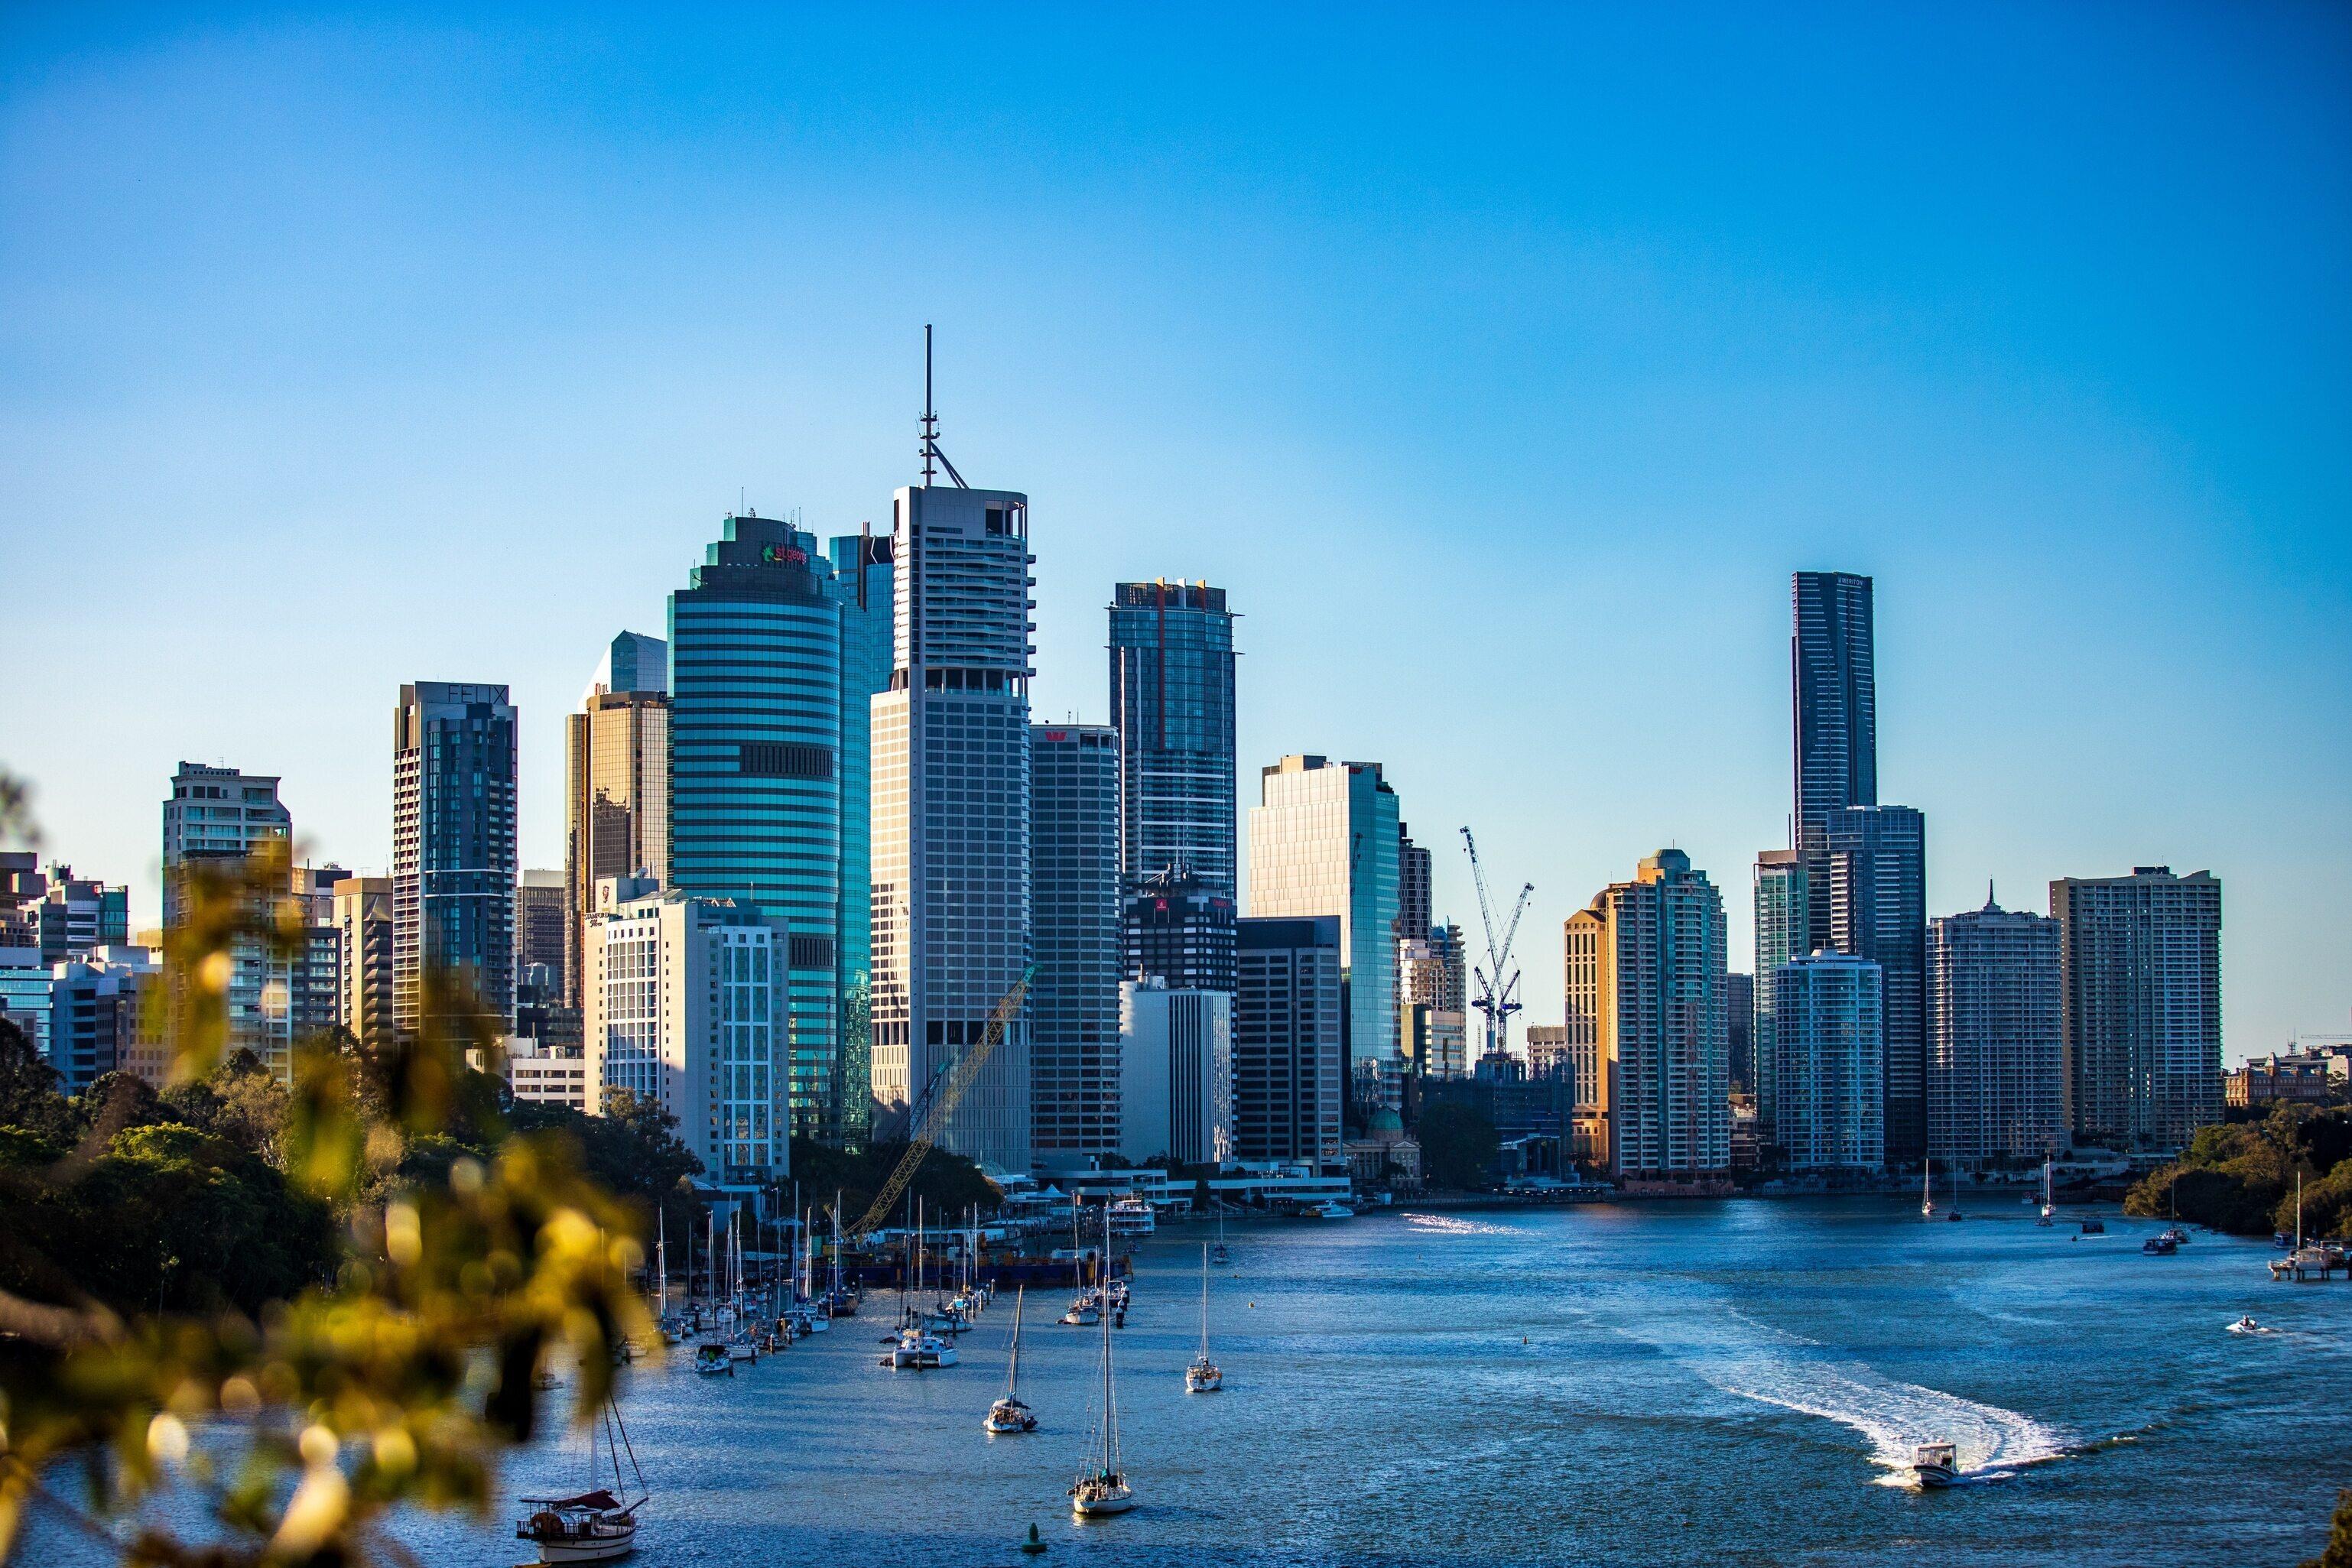 The skyline of Brisbane, Australia